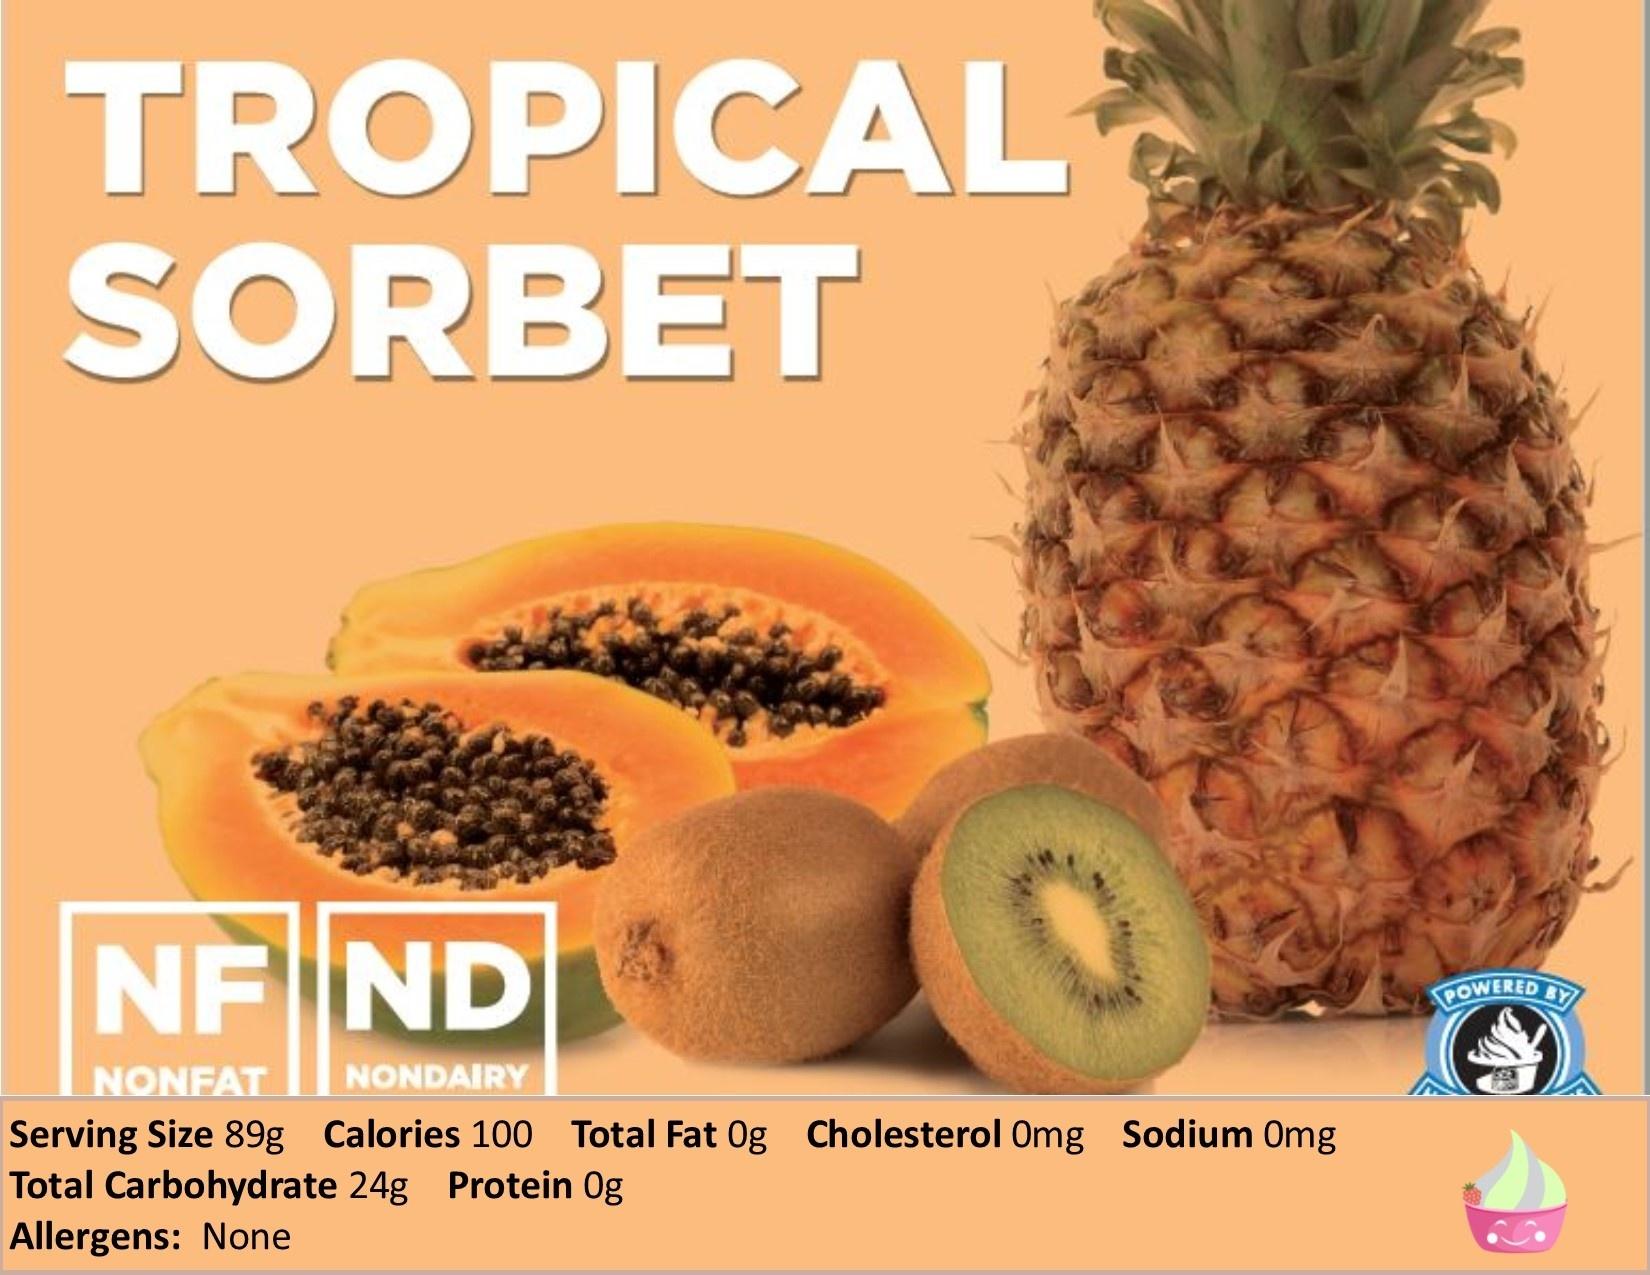 https://0201.nccdn.net/1_2/000/000/18c/ccc/Tropical-Sorbet-1650x1275-1650x1275.jpg